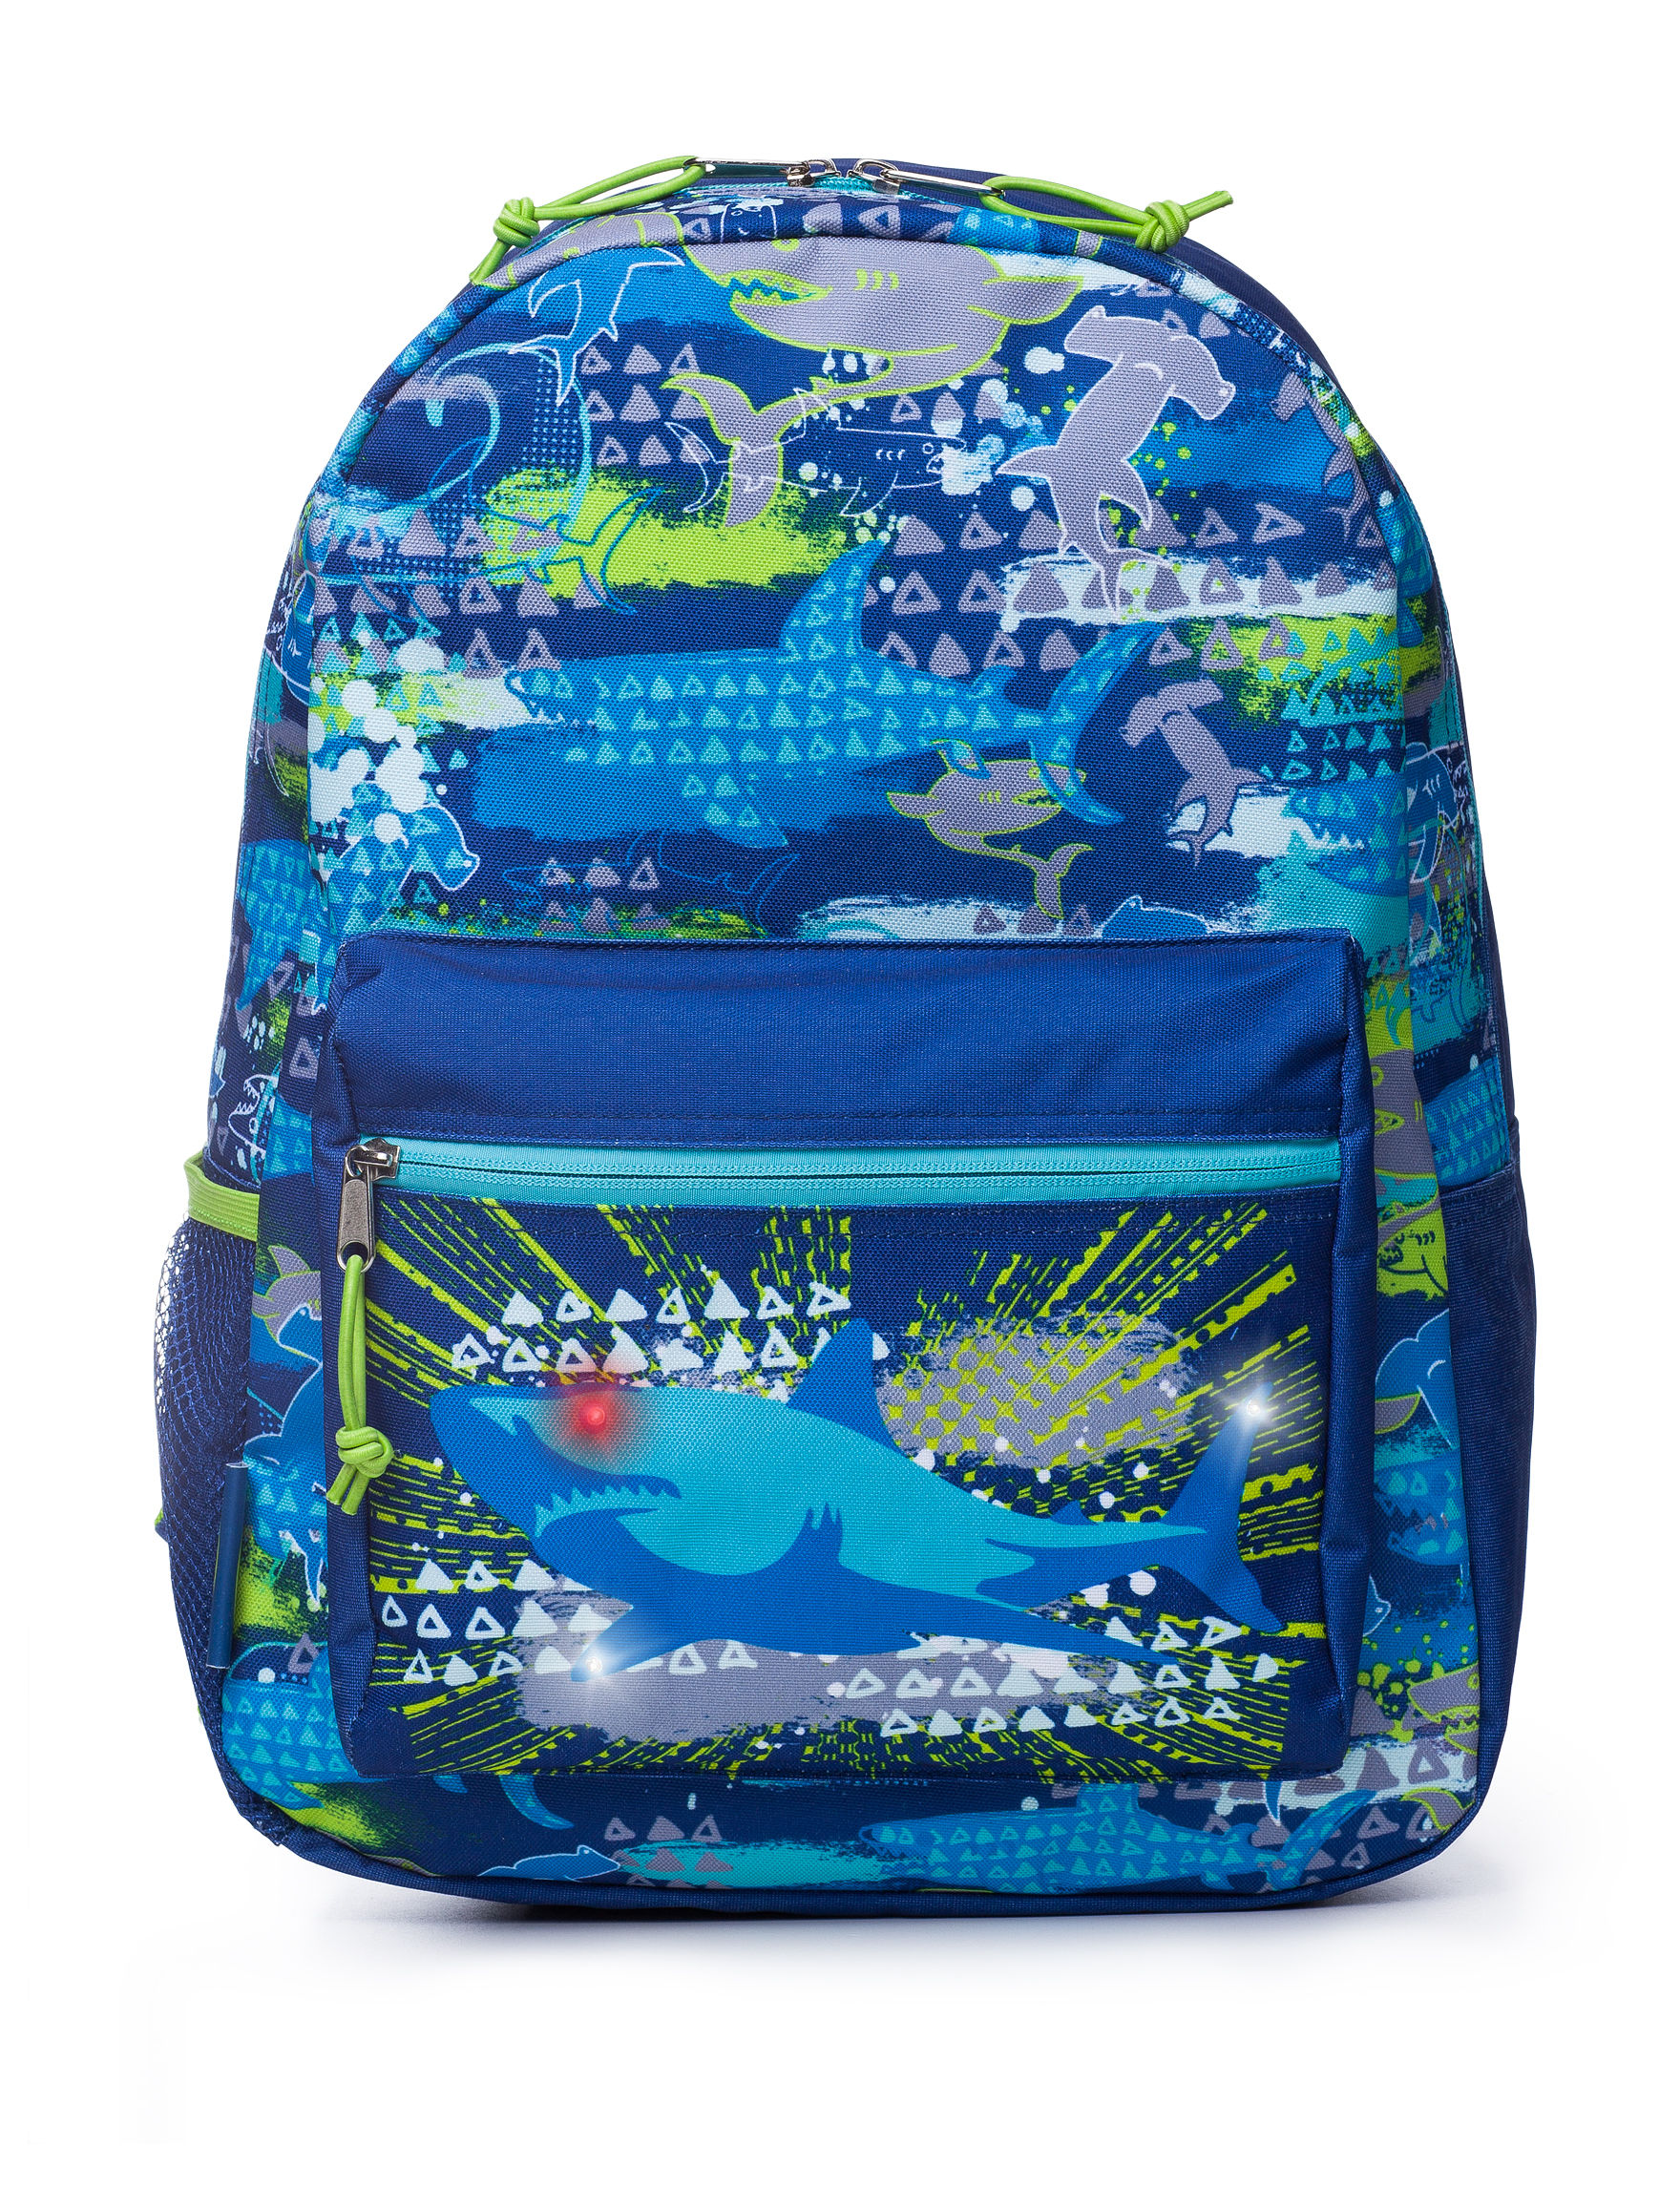 Ad Sutton Blue Bookbags & Backpacks